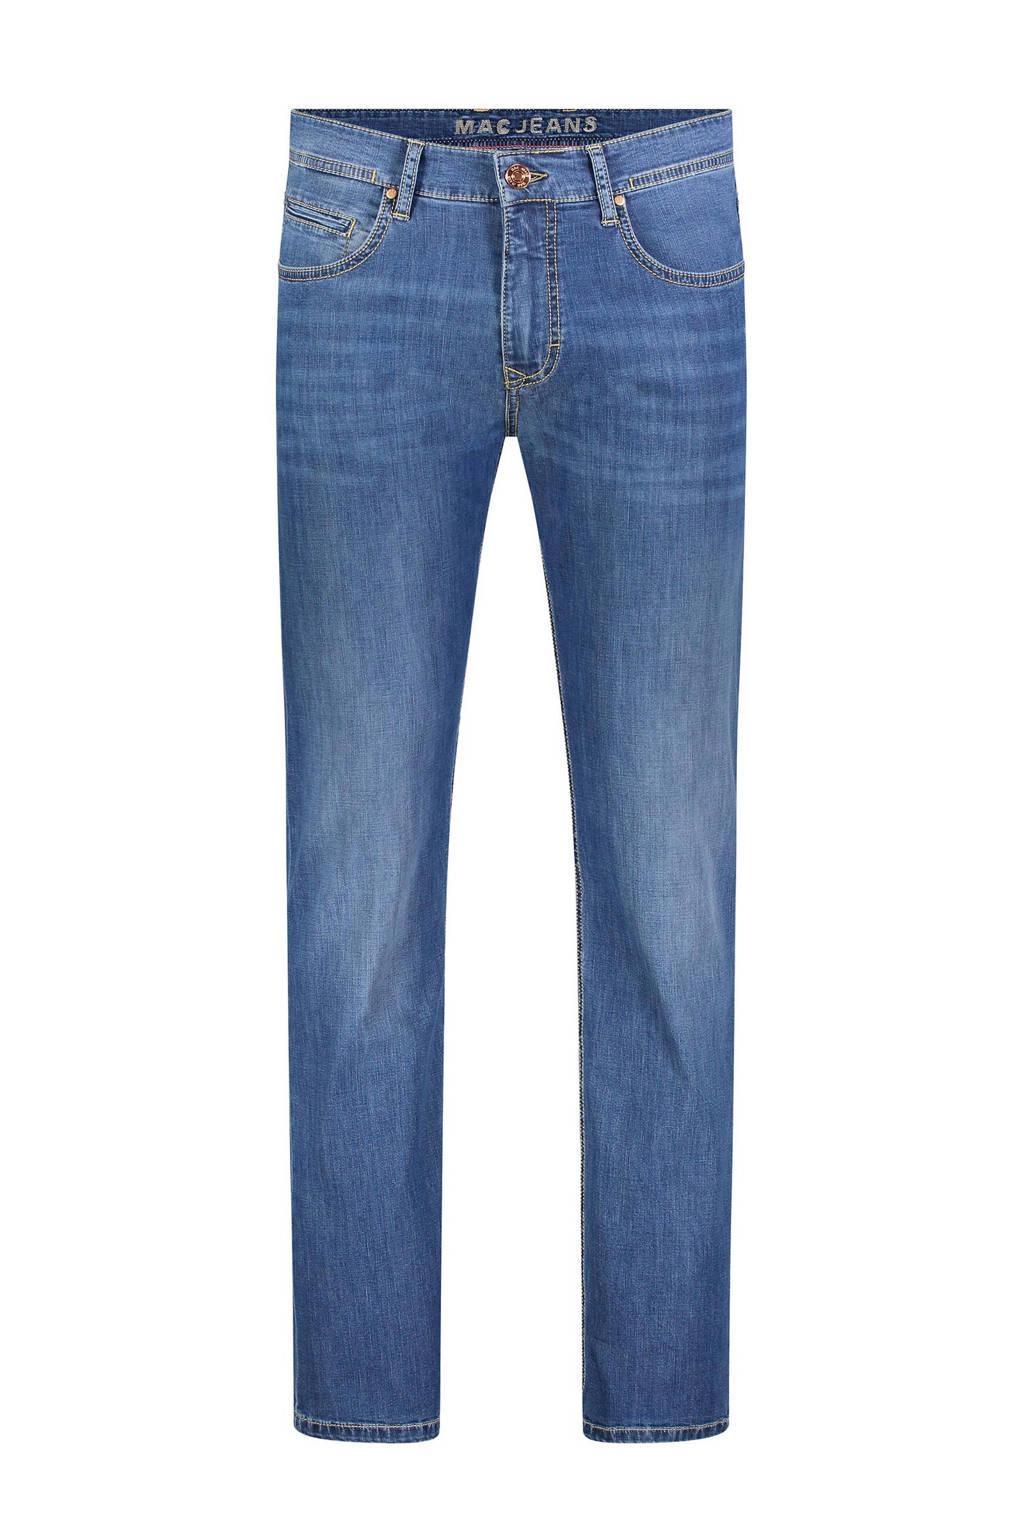 MAC straight fit jeans Arne h430 midblue authentic used, H430 midblue authentic used